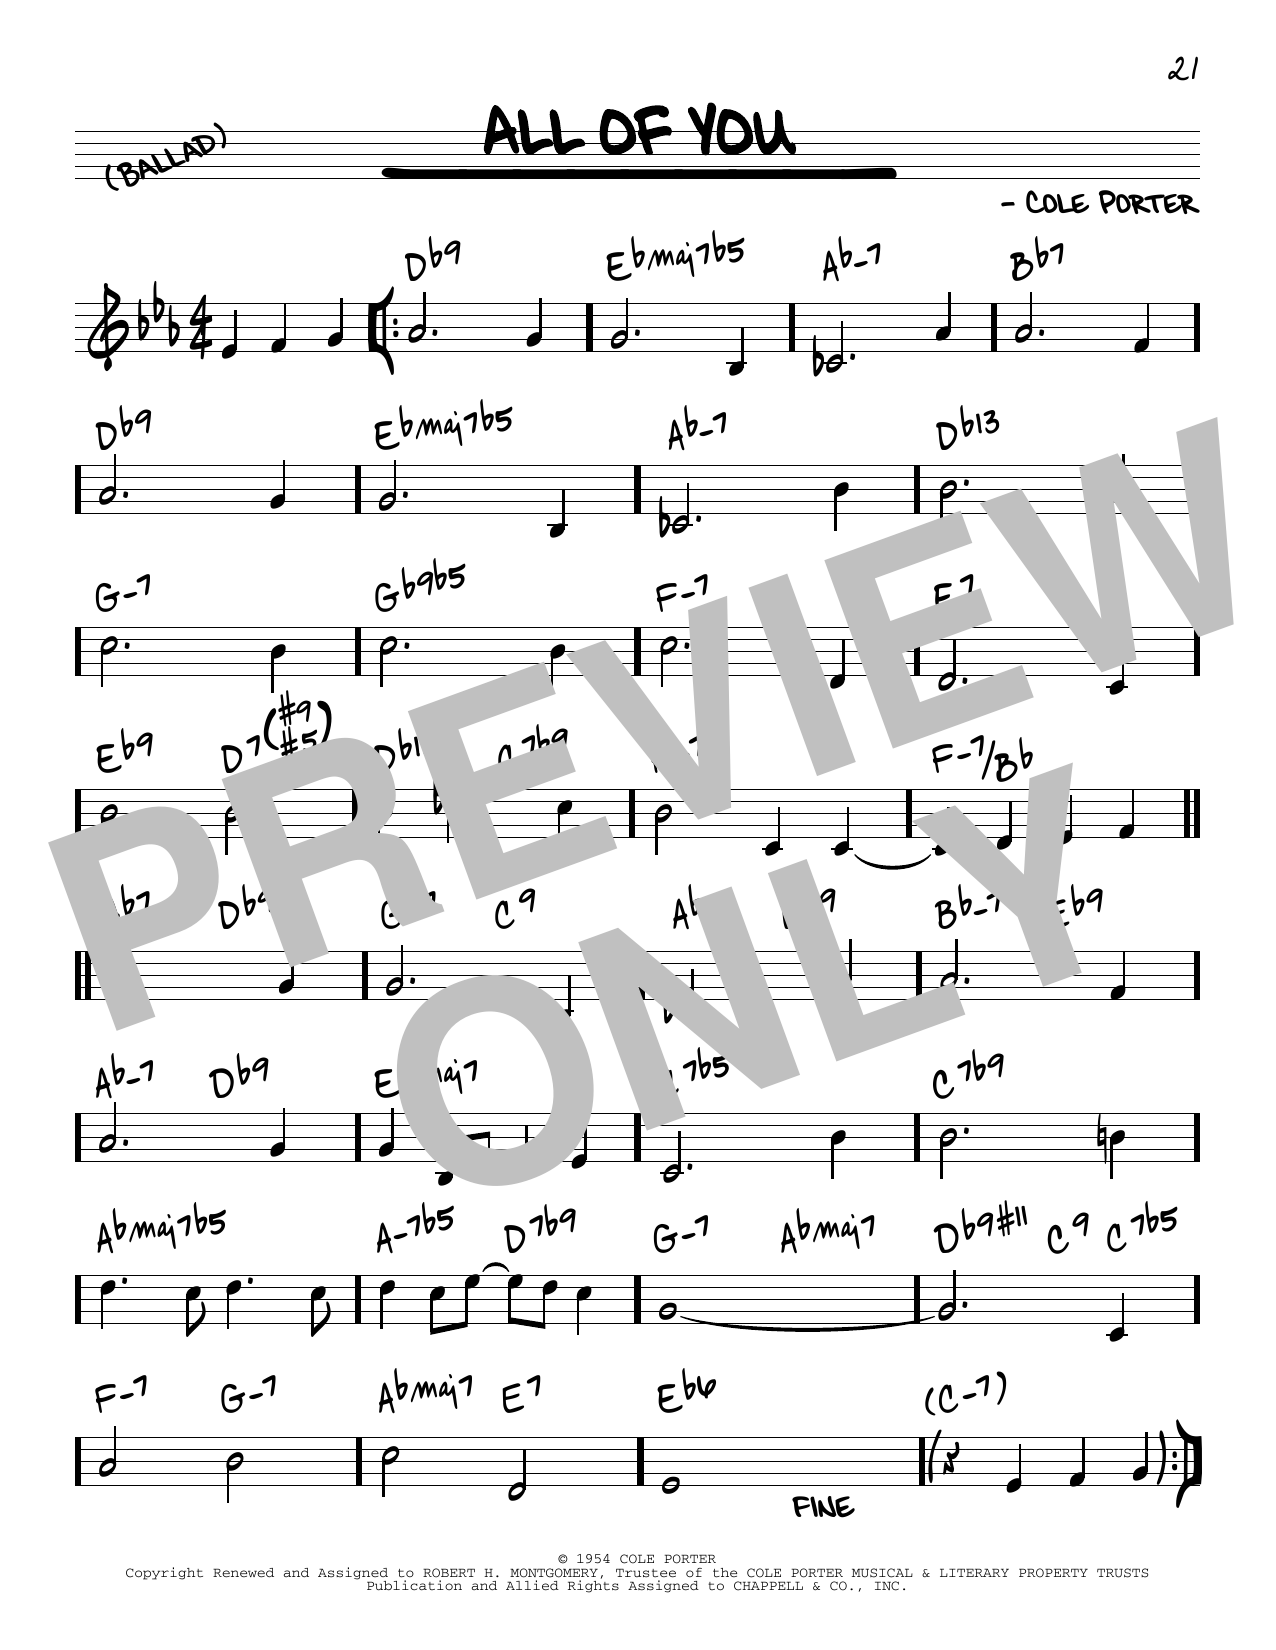 Cole Porter All Of You [Reharmonized version] (arr. Jack Grassel) sheet music notes printable PDF score